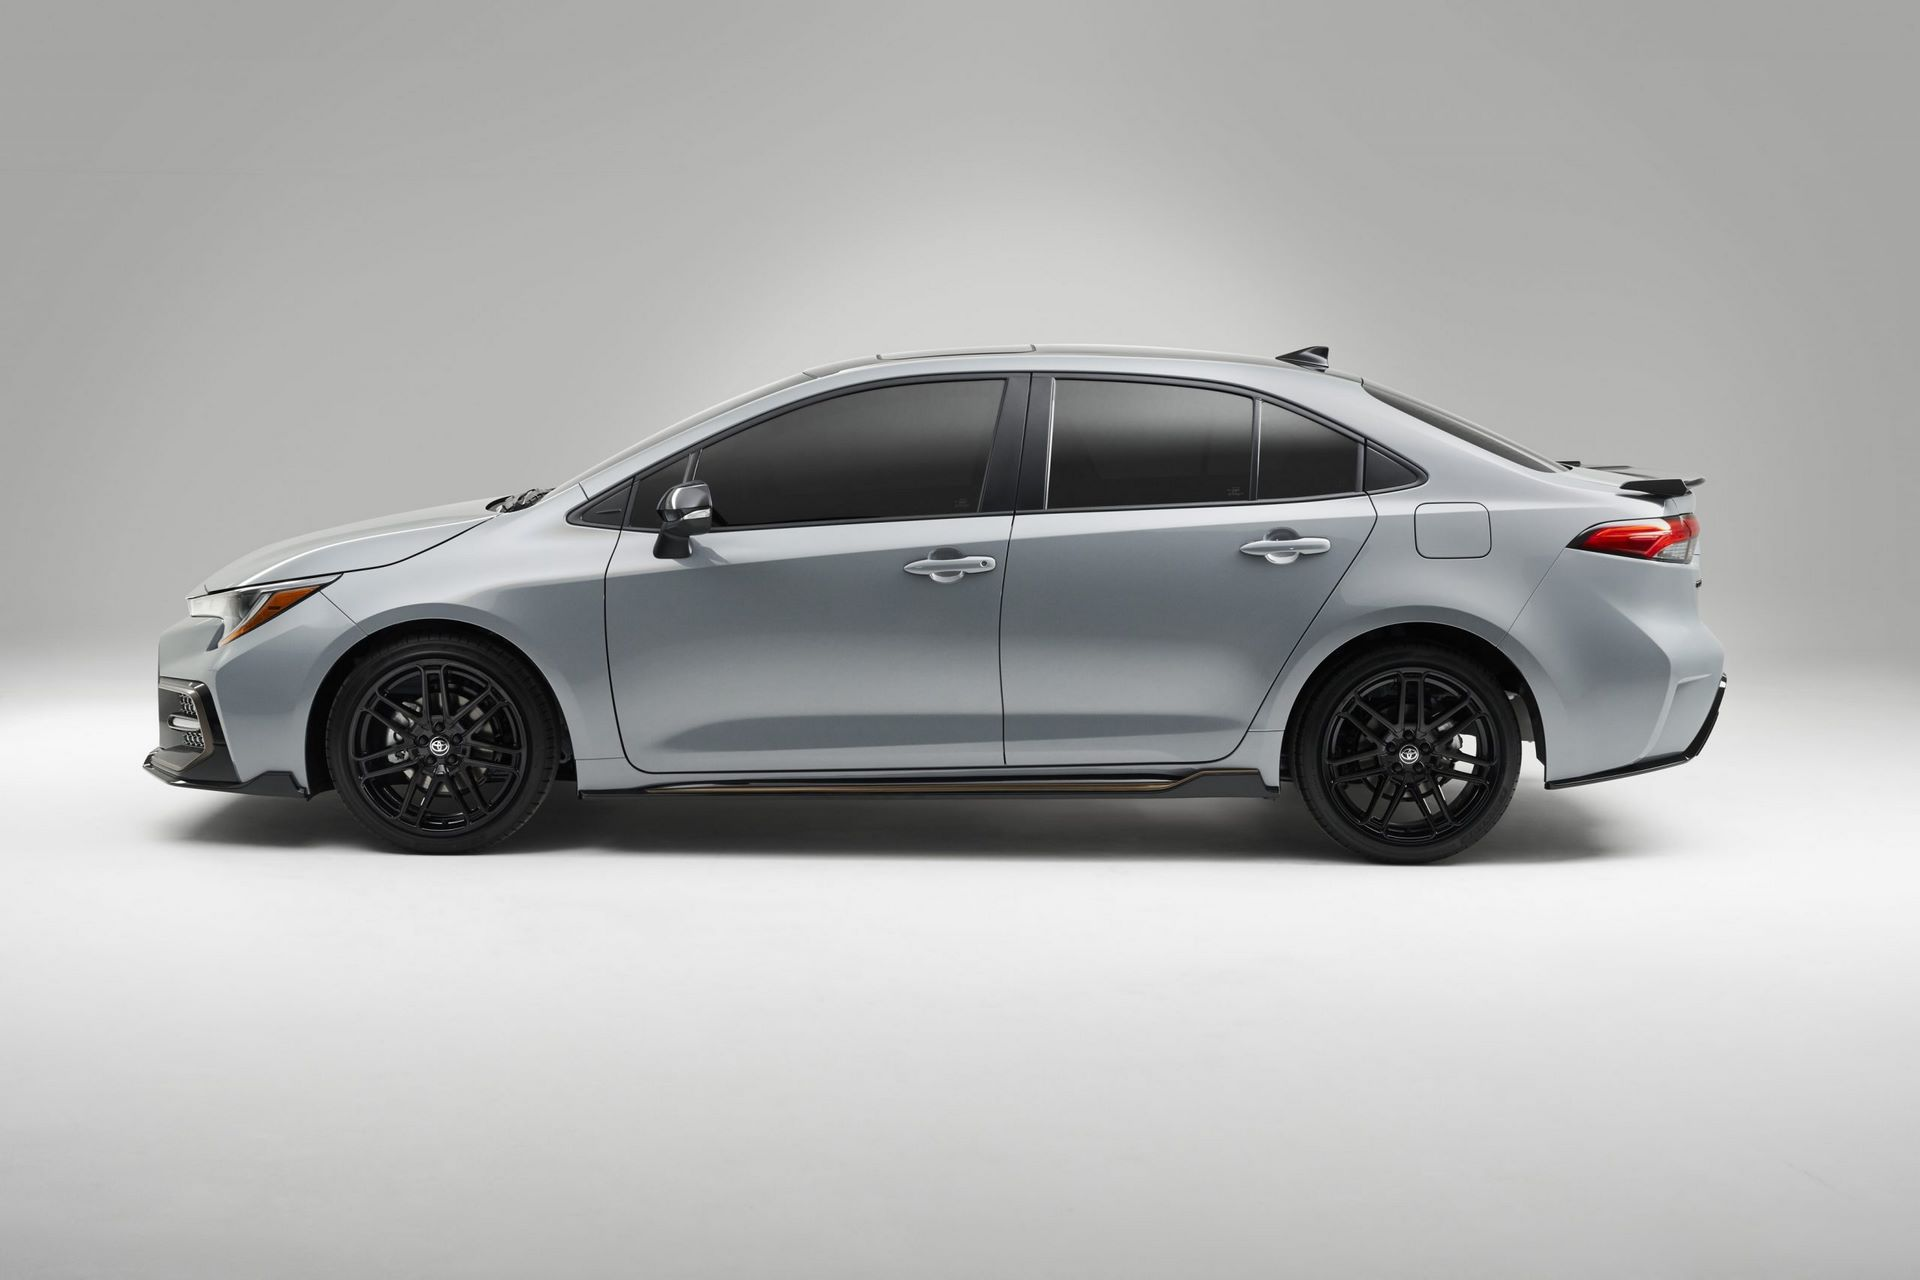 2021-Toyota-Corolla-Apex_009-scaled